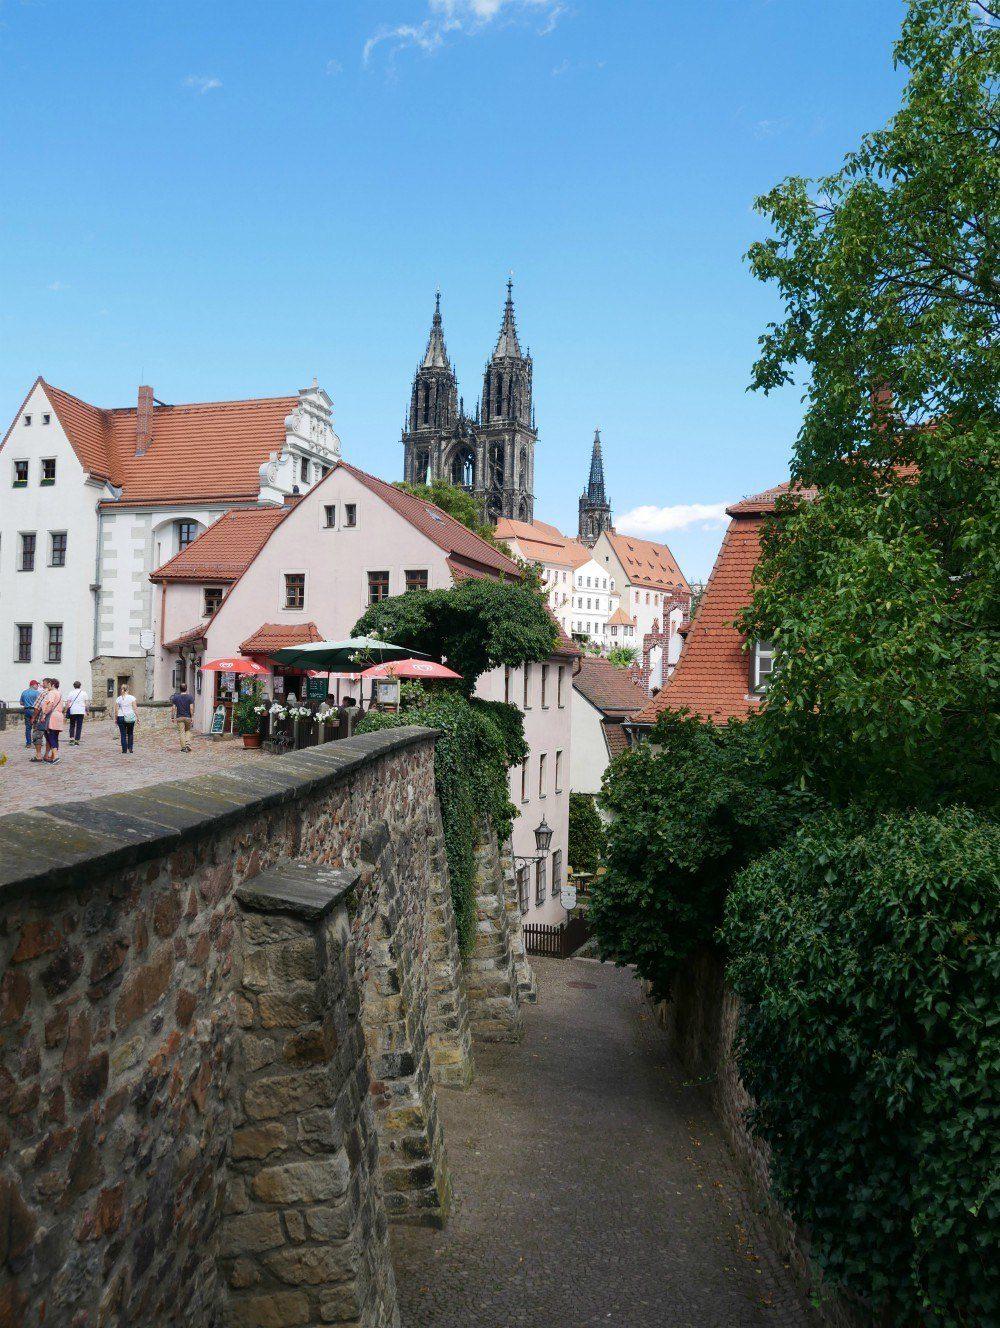 Views from Meissen in Saxony, Germany Photo Heatheronhertravels.com